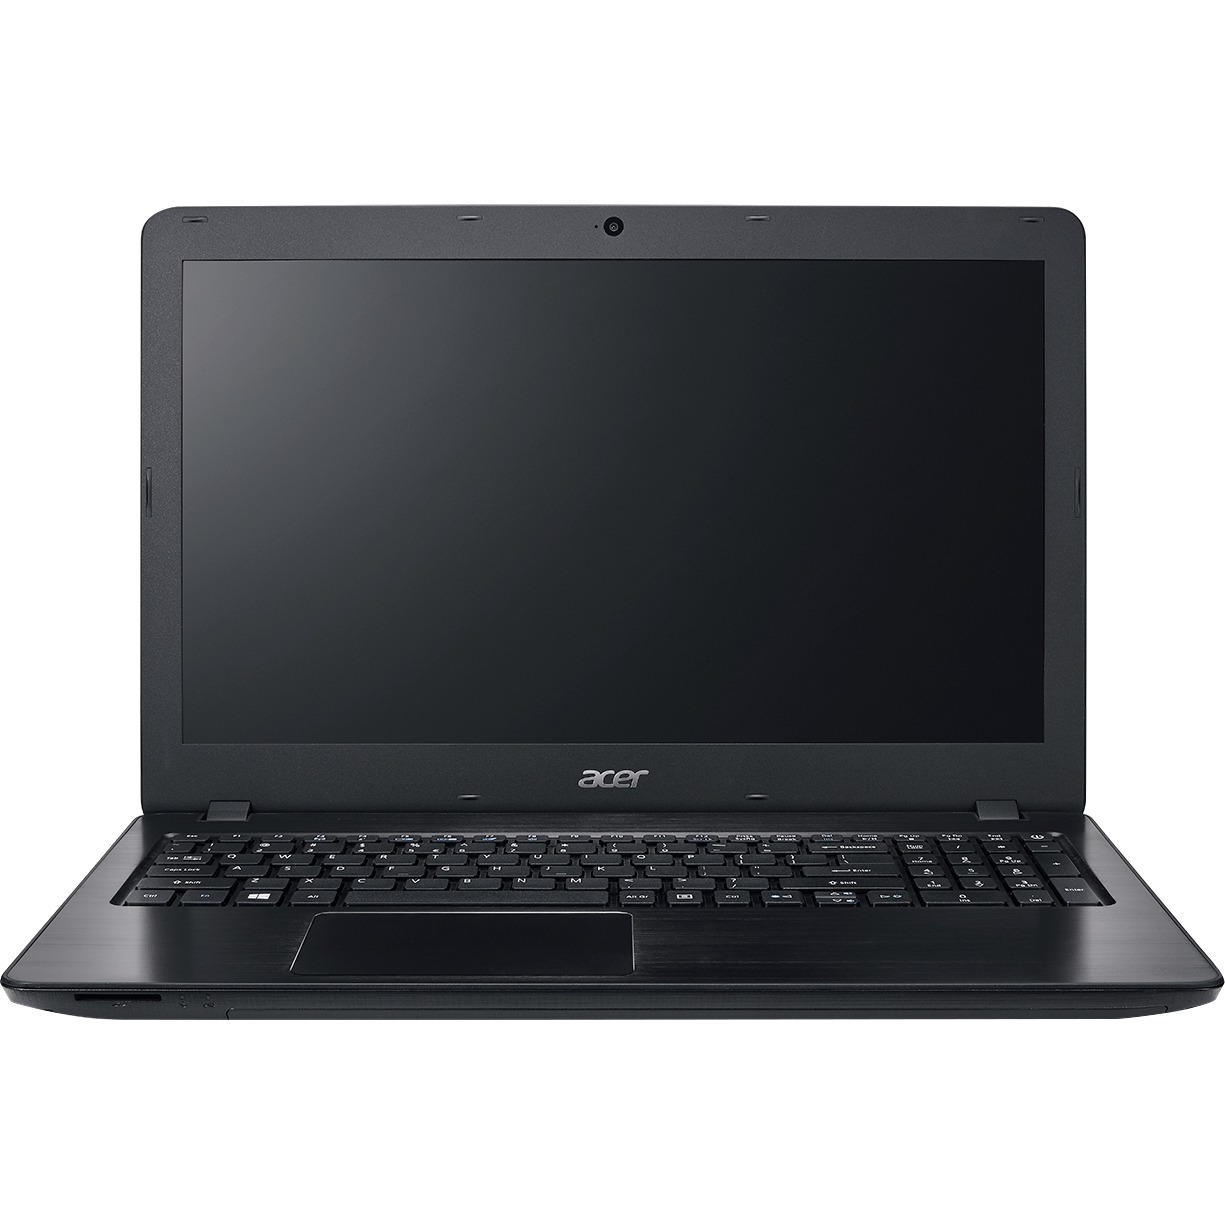 Acer Aspire NX.GD3AA.001 Laptop PC - Intel Core I5-7200U ...